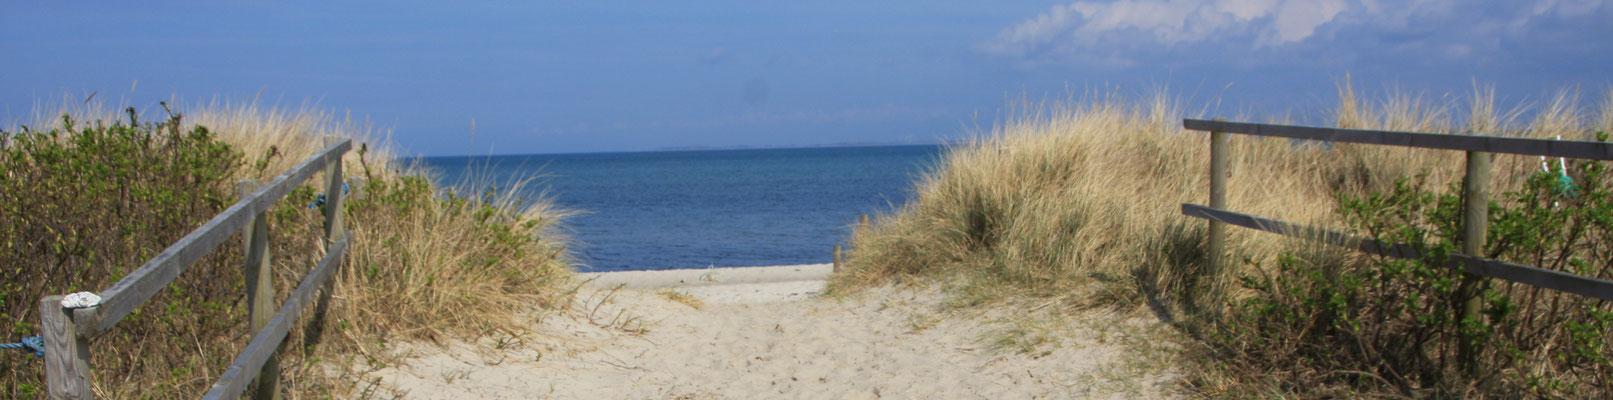 Naturbelassene Strandaufgänge